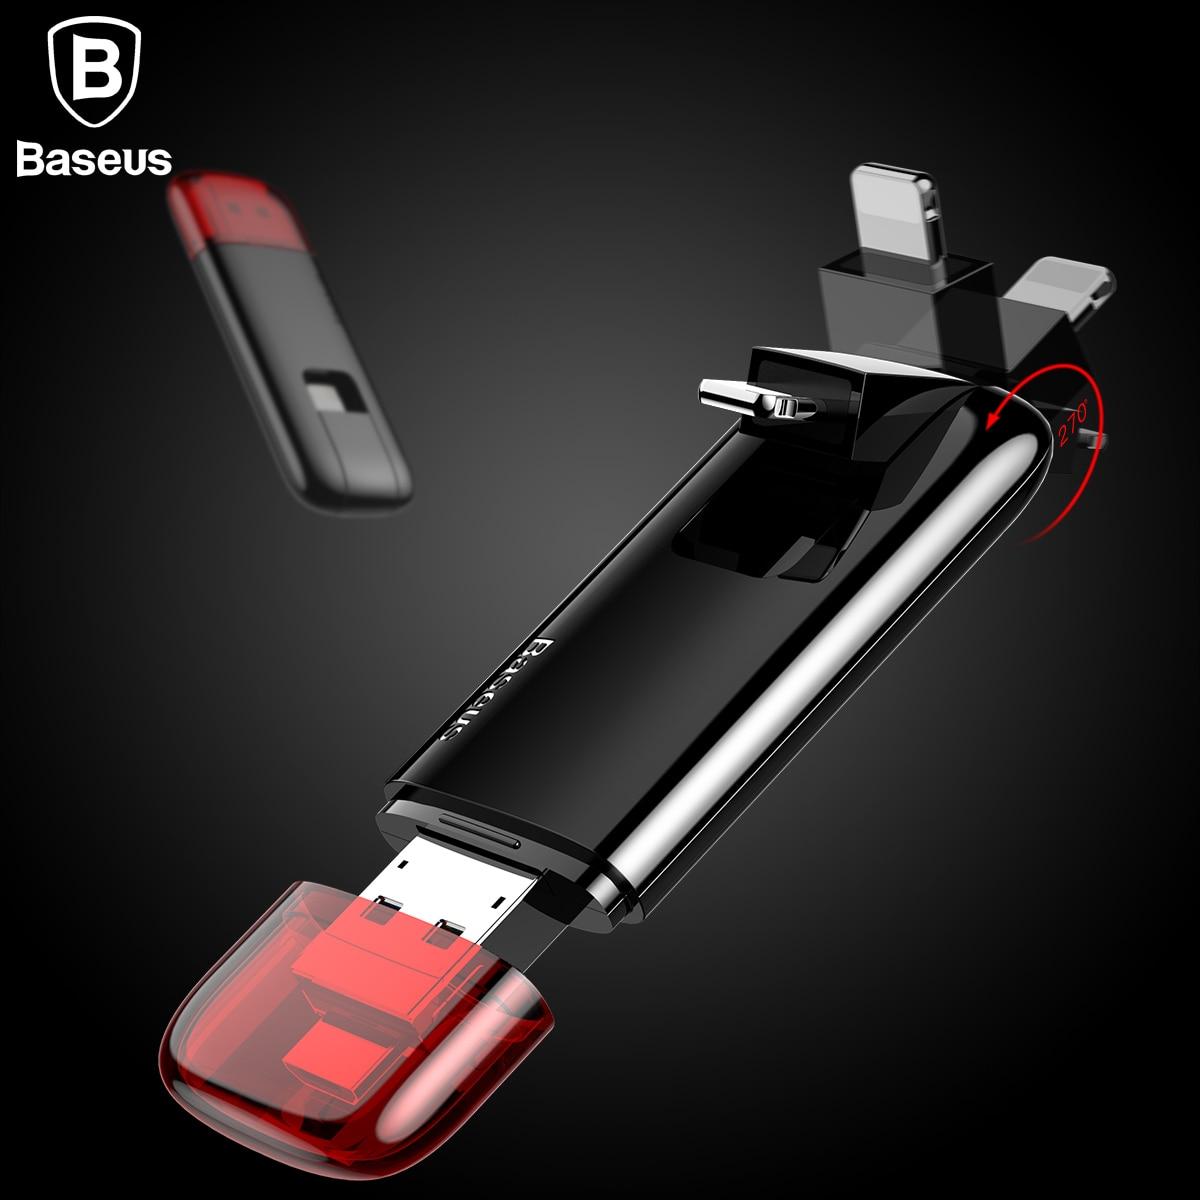 Baseus 3in1 unidades Flash USB para iPhone 5 5 5 6 6 7 8 U disco Teléfono de almacenamiento de memoria Stick 32G 64G Pendrive para Samsung Micro USB de disco U